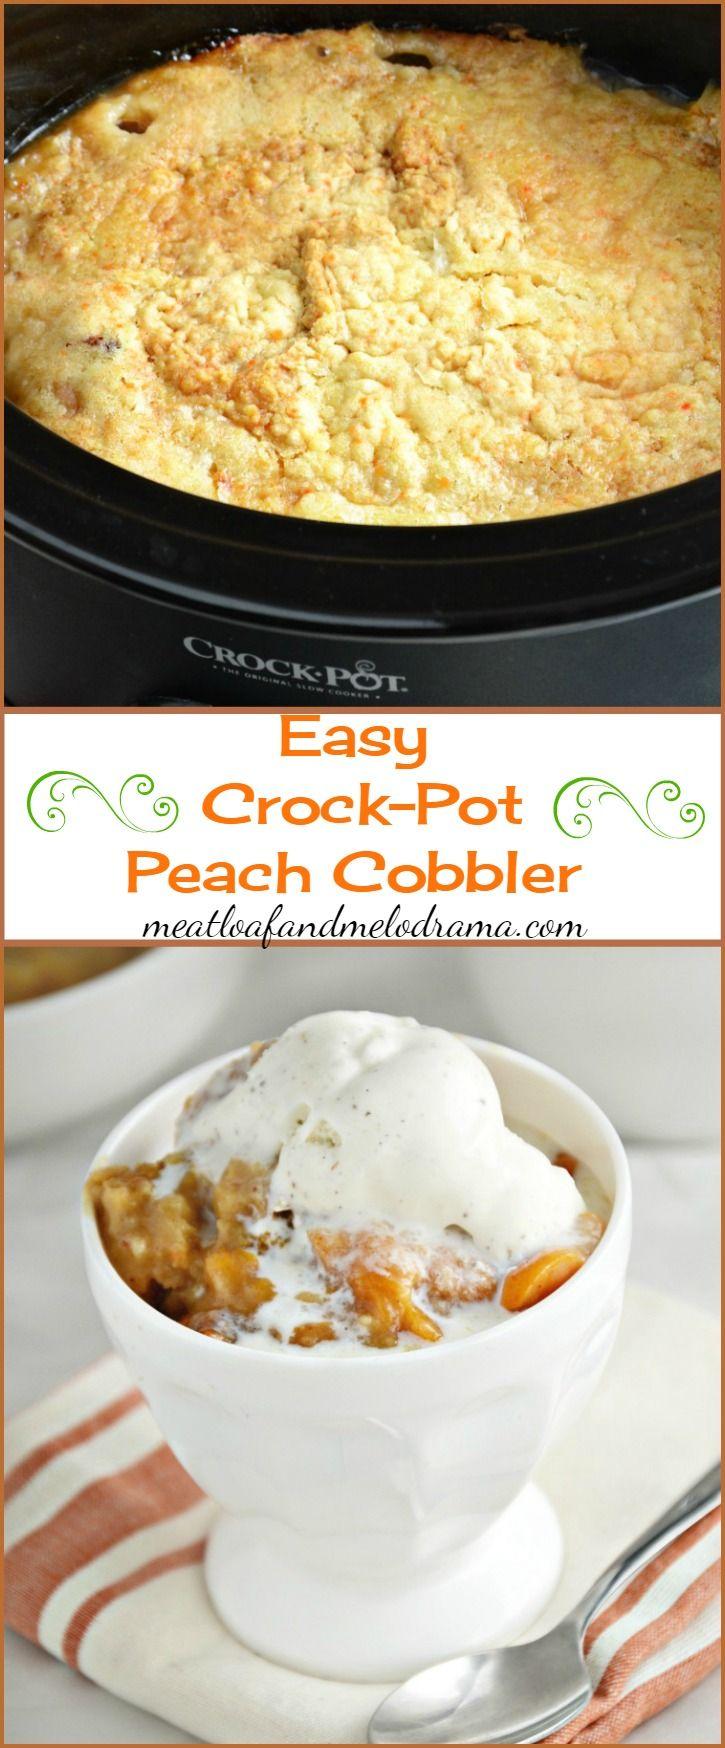 Easy Crock-Pot Peach Cobbler Recipe